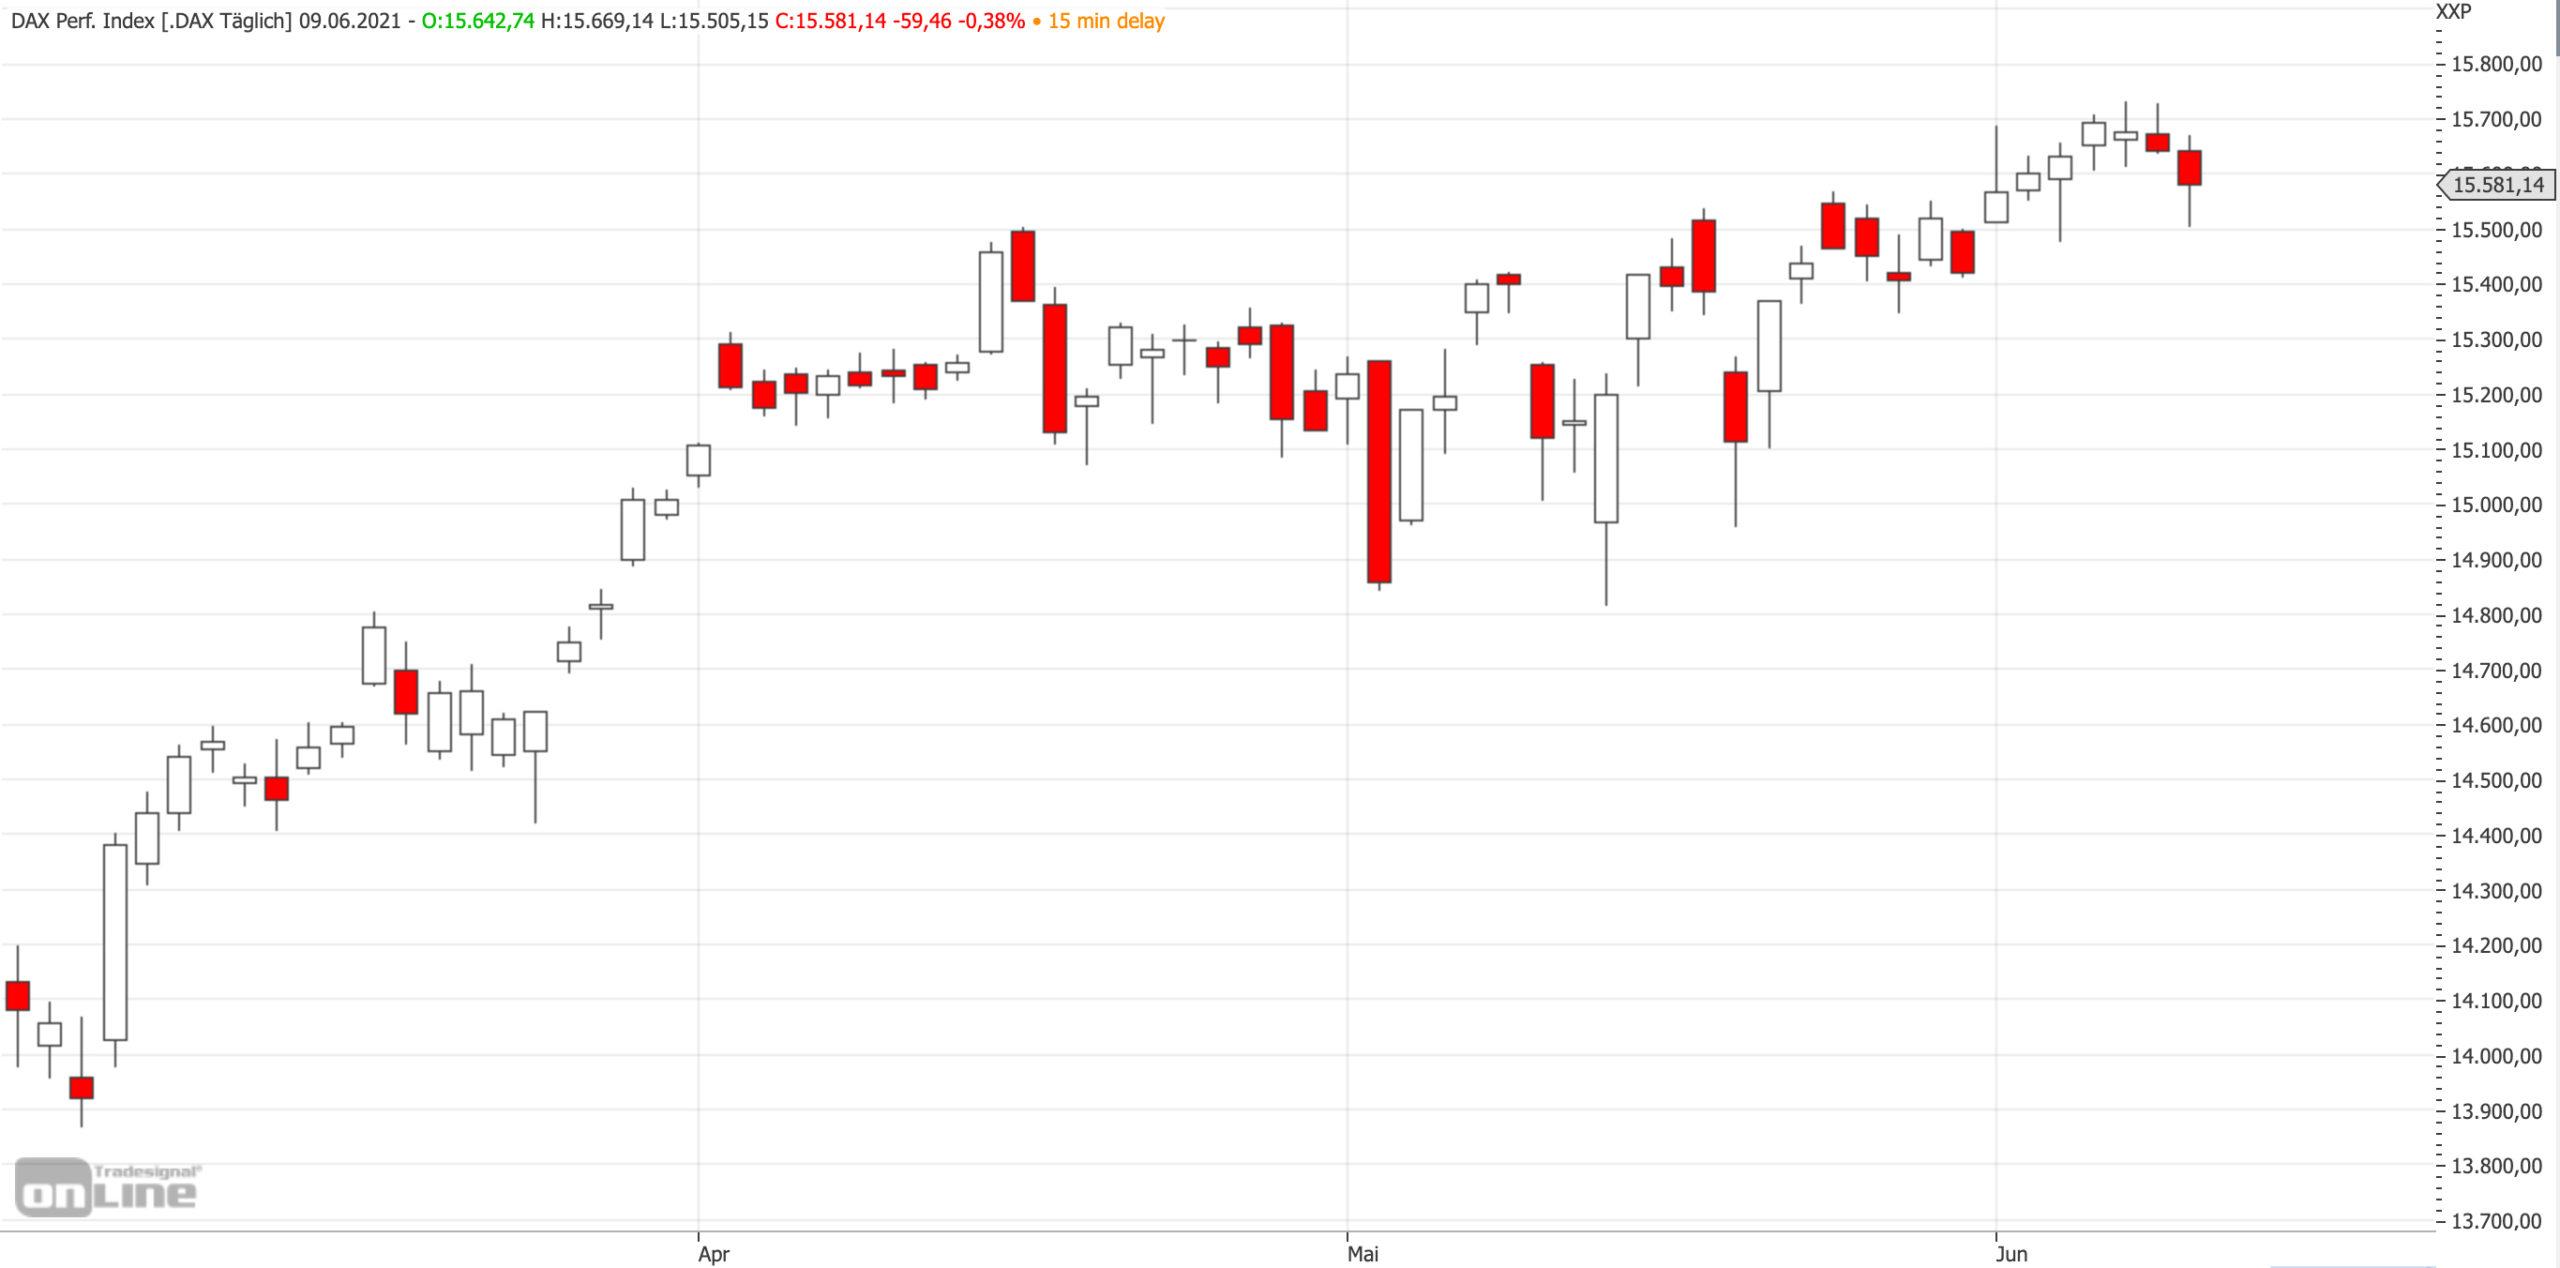 Mittelfristiger DAX-Chart am 09.06.2021